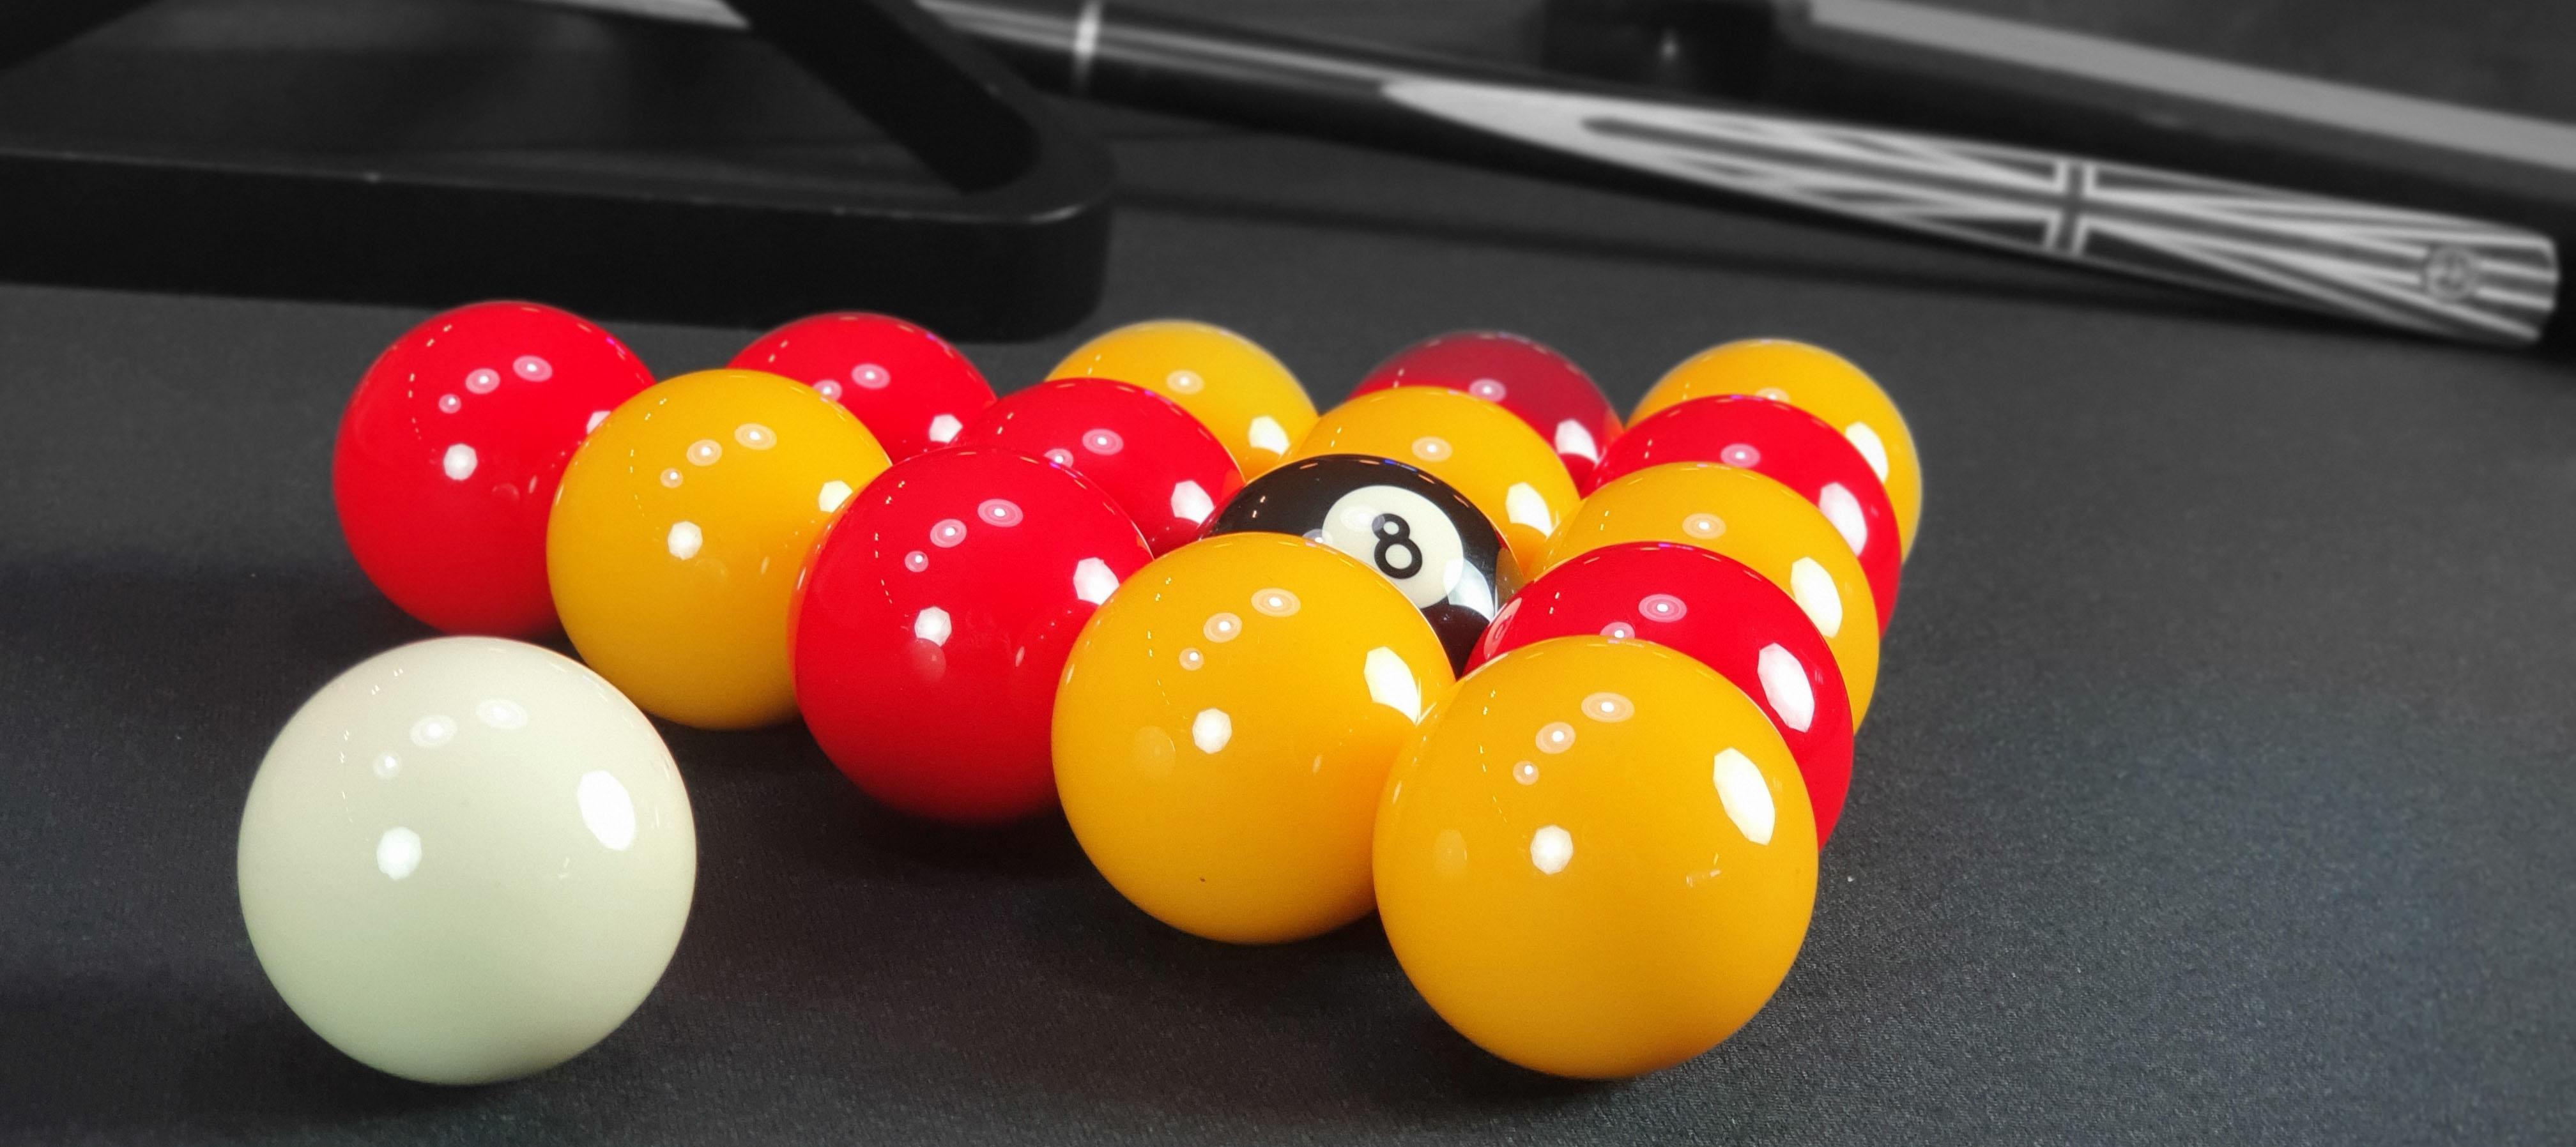 Boules de billard 8 pool